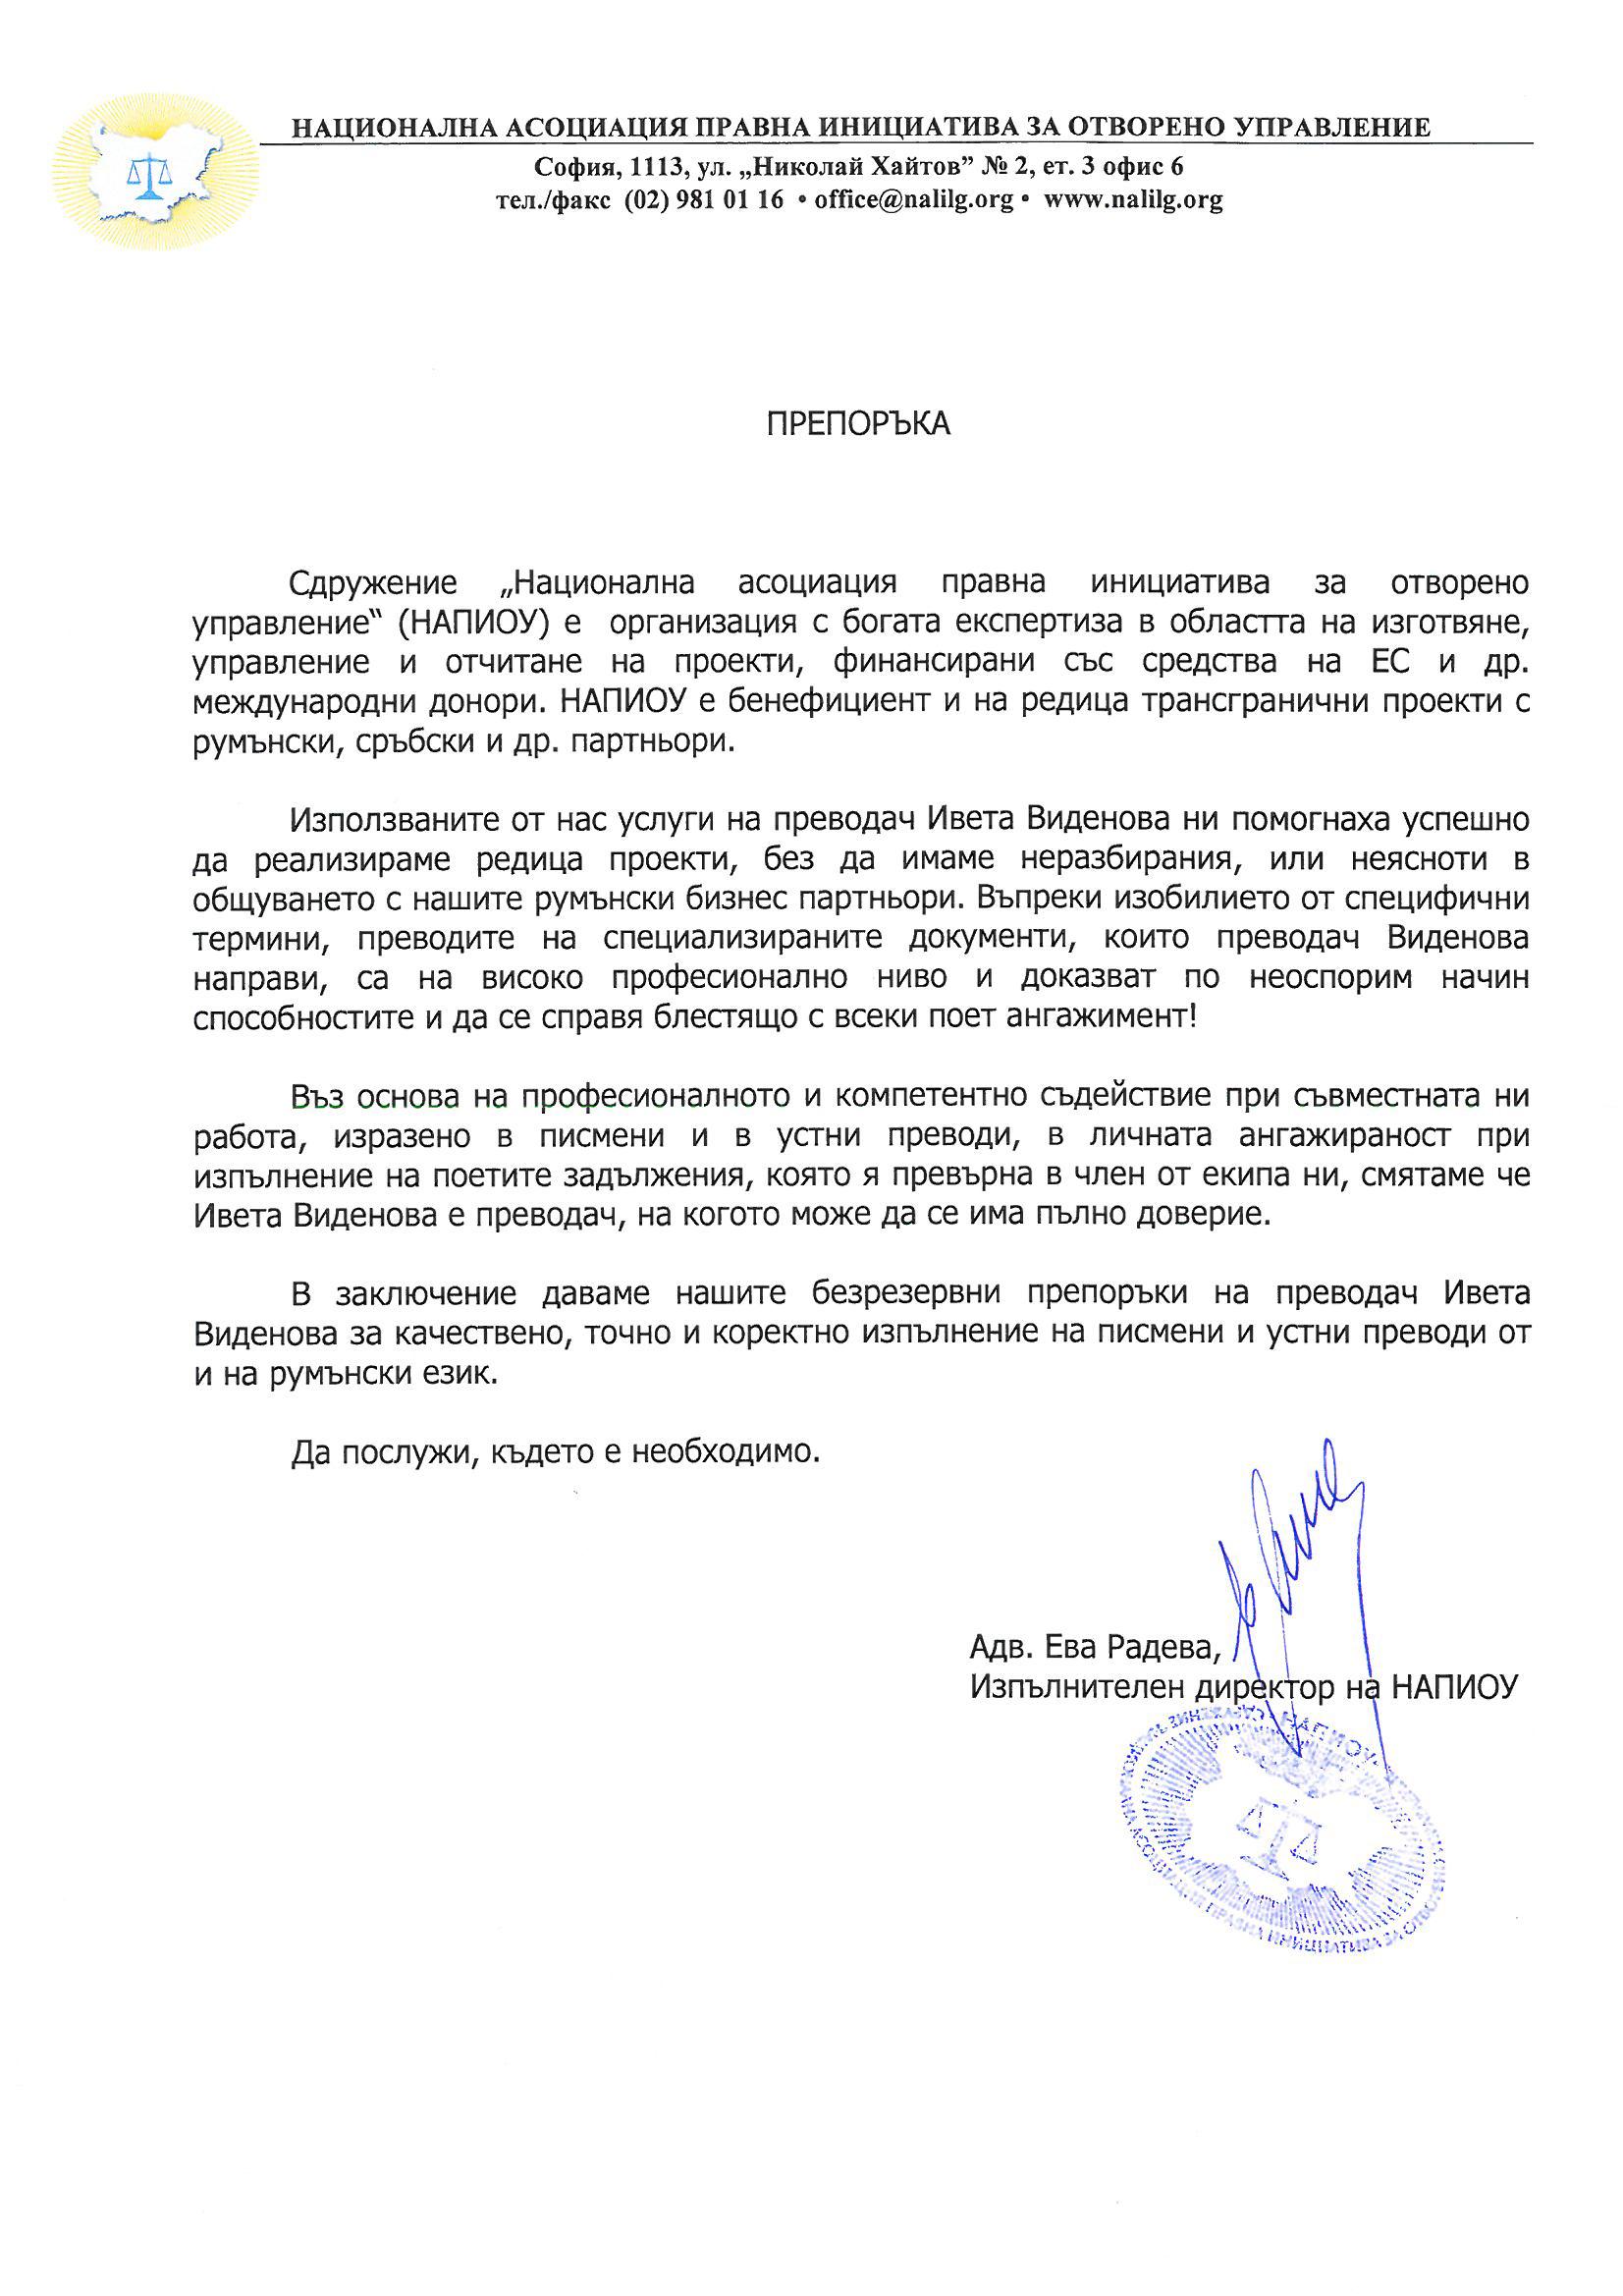 preporyka_NAPIMS